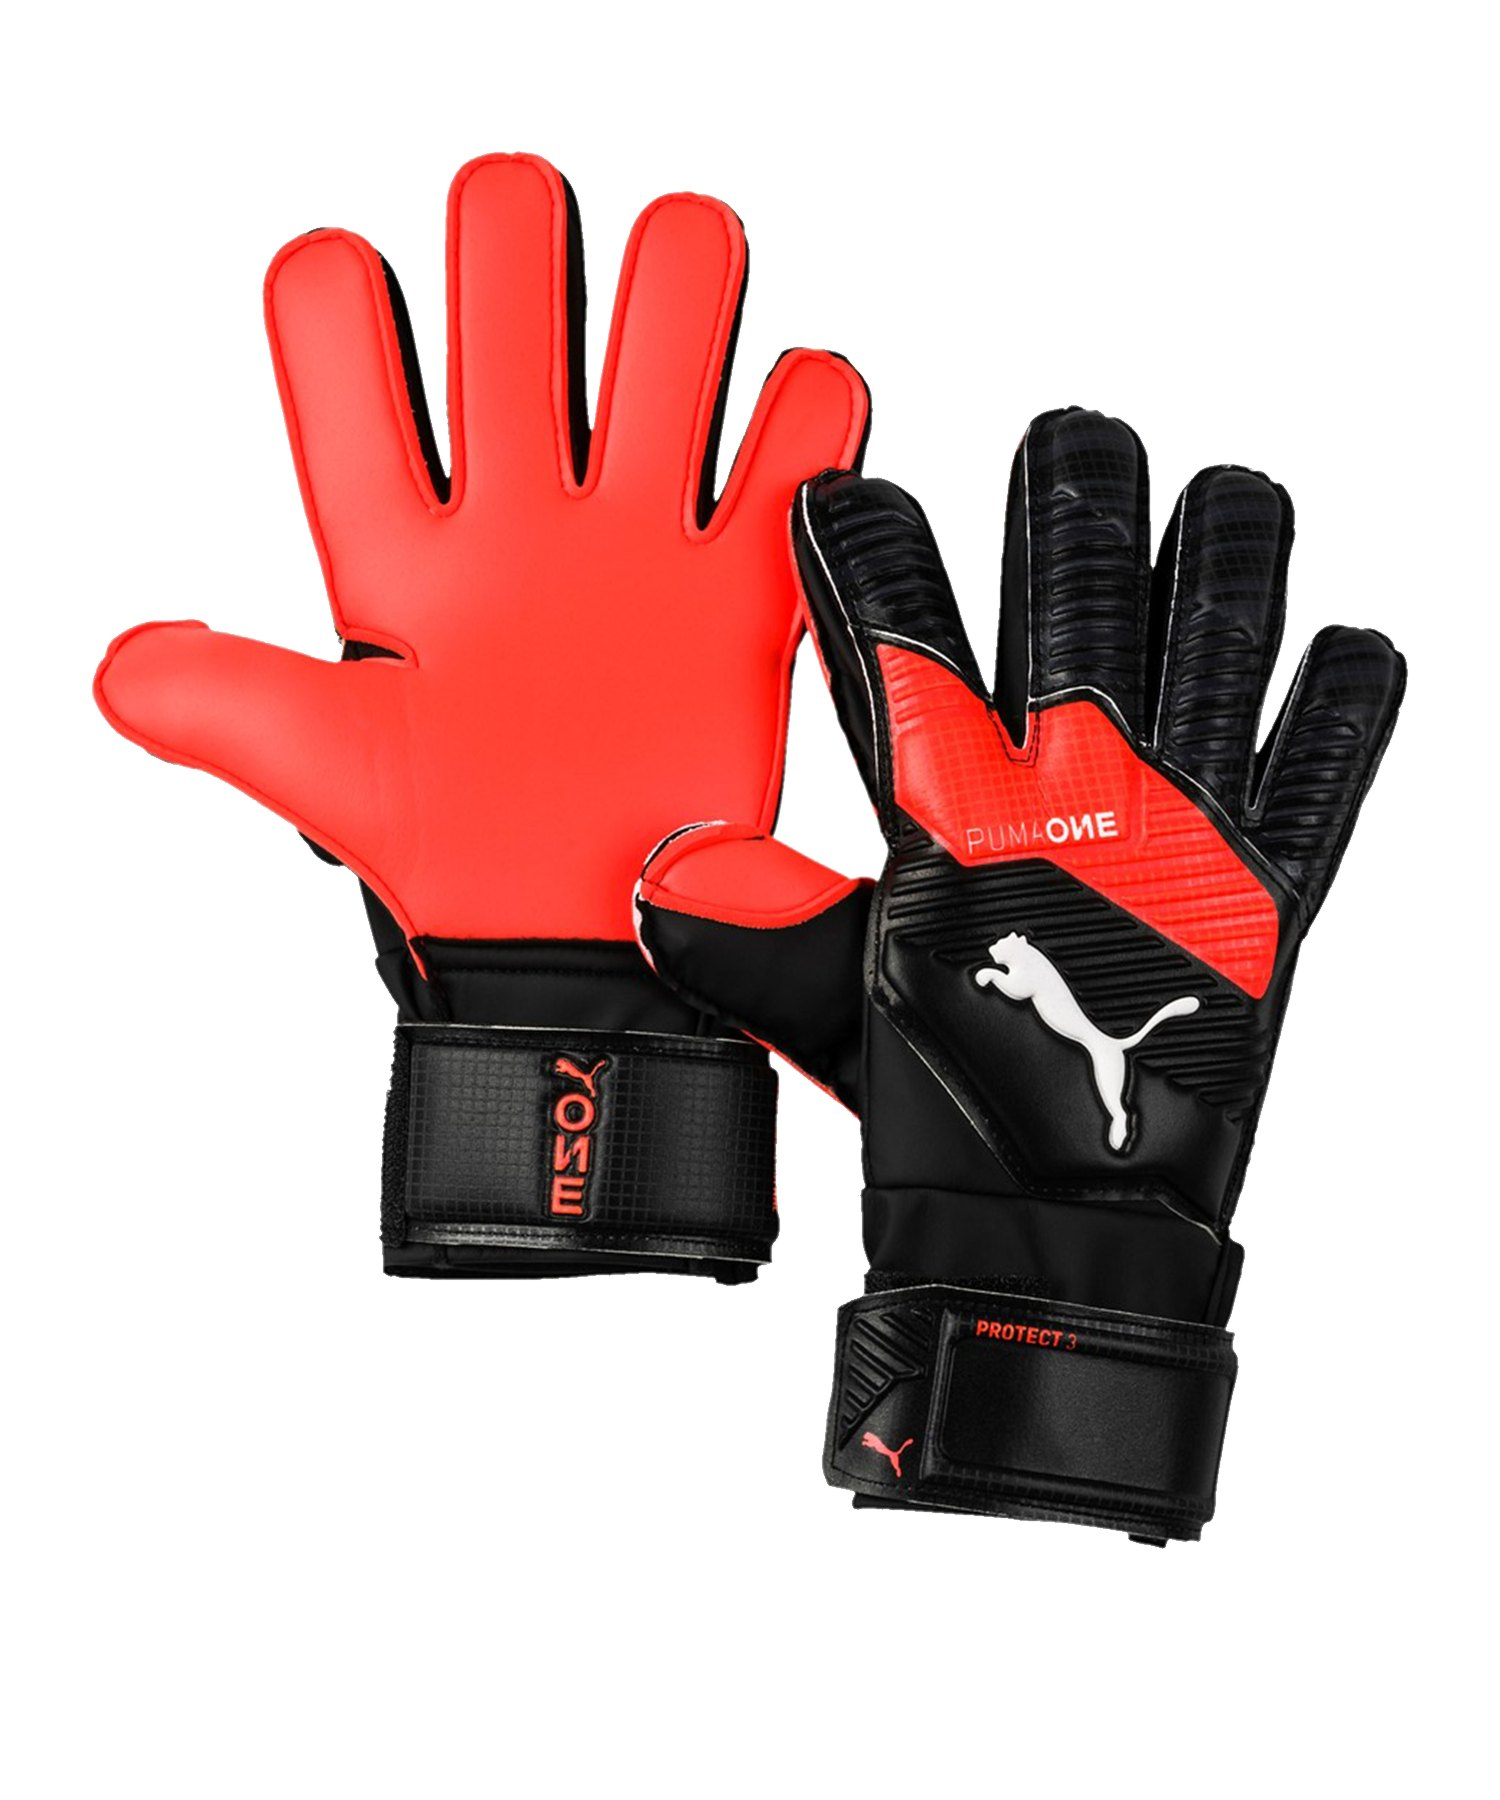 PUMA ONE Protect 3 TW-Handschuh Kids Schwarz F01 - Schwarz